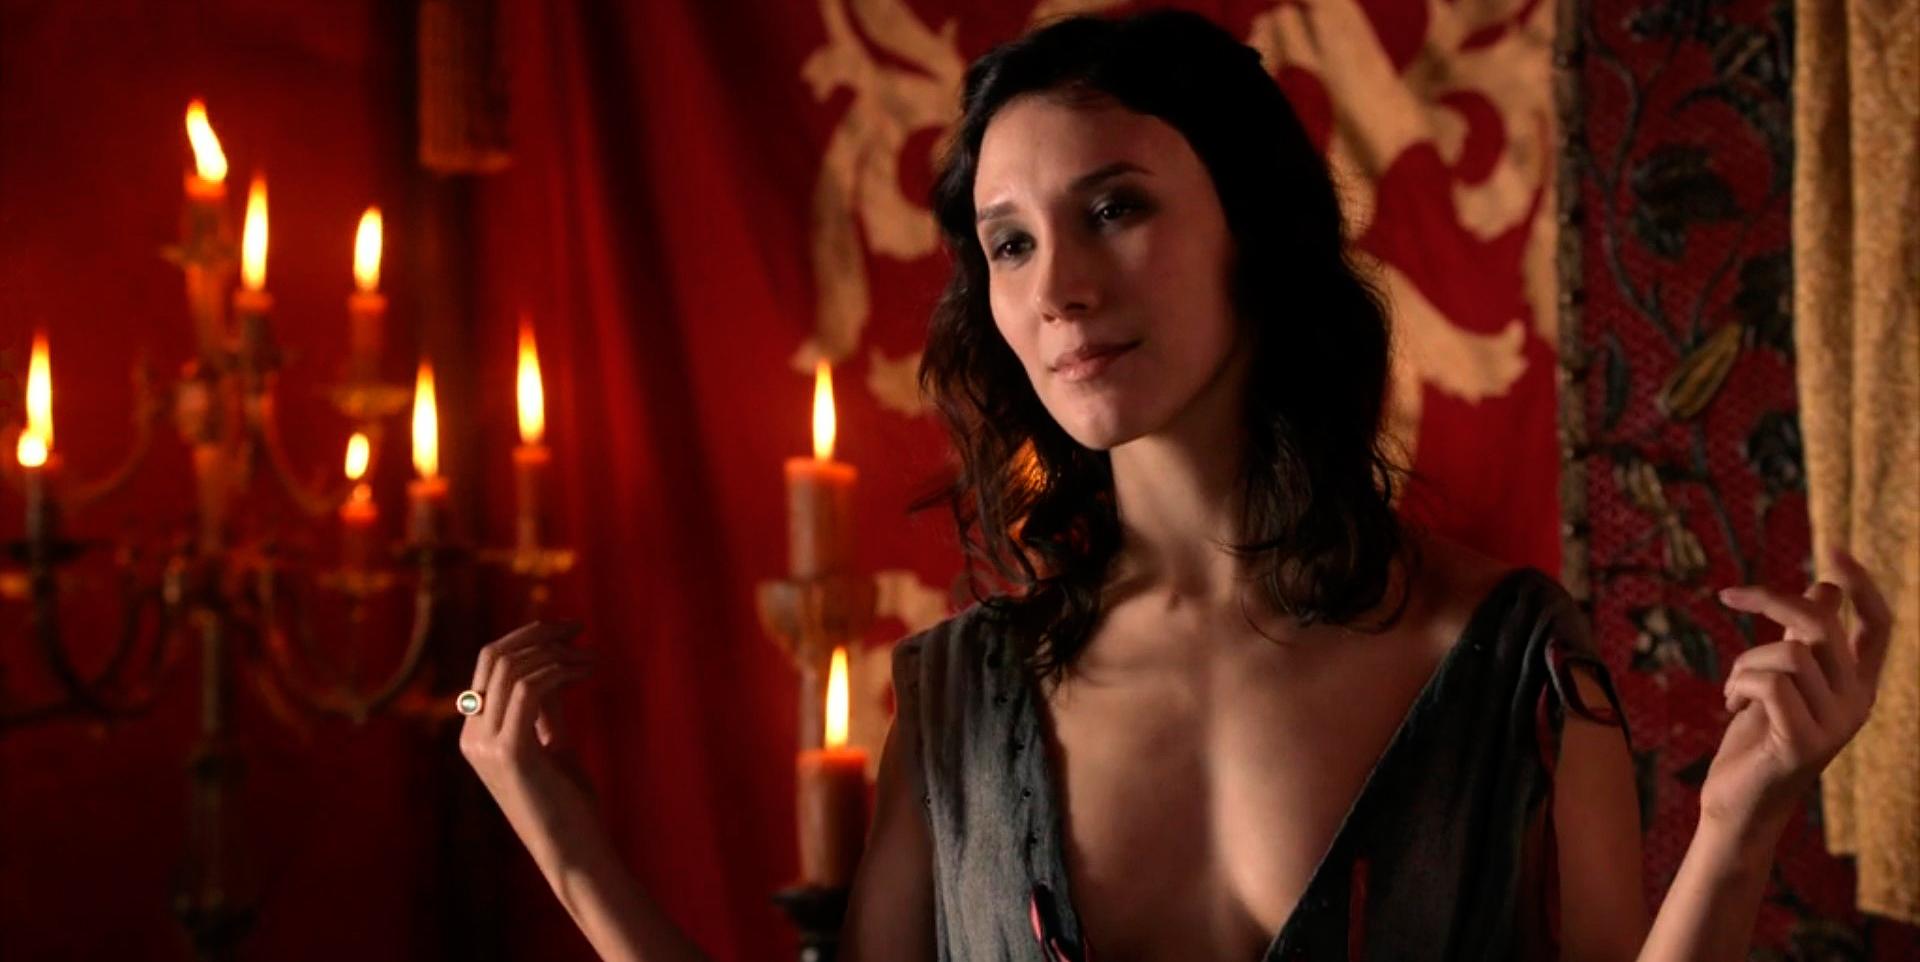 Sibel Kekilli juego de tronos